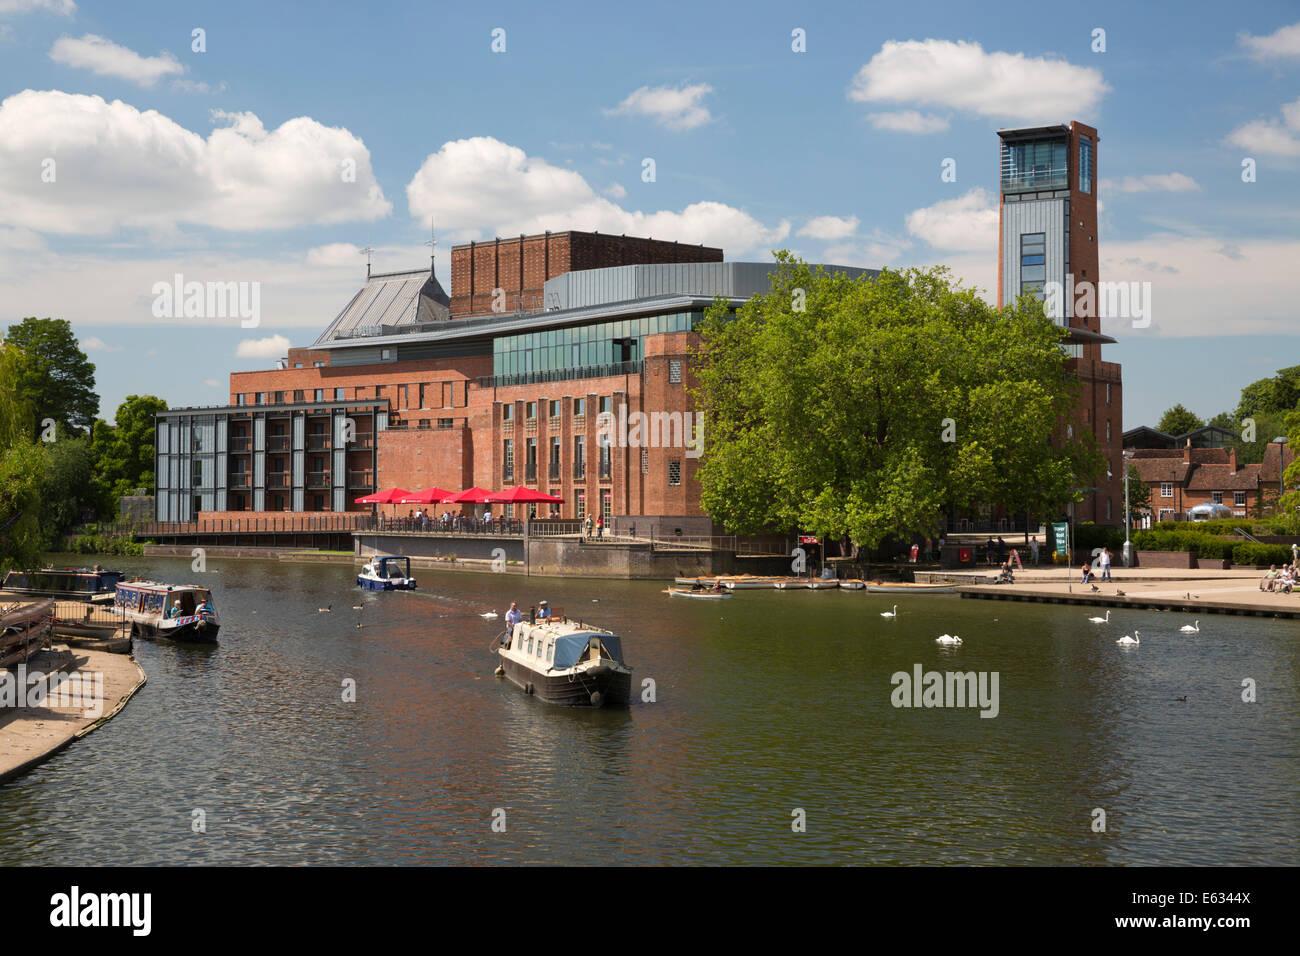 Royal Shakespeare Theatre on the River Avon, Stratford-upon-Avon, Warwickshire, England, United Kingdom, Europe - Stock Image